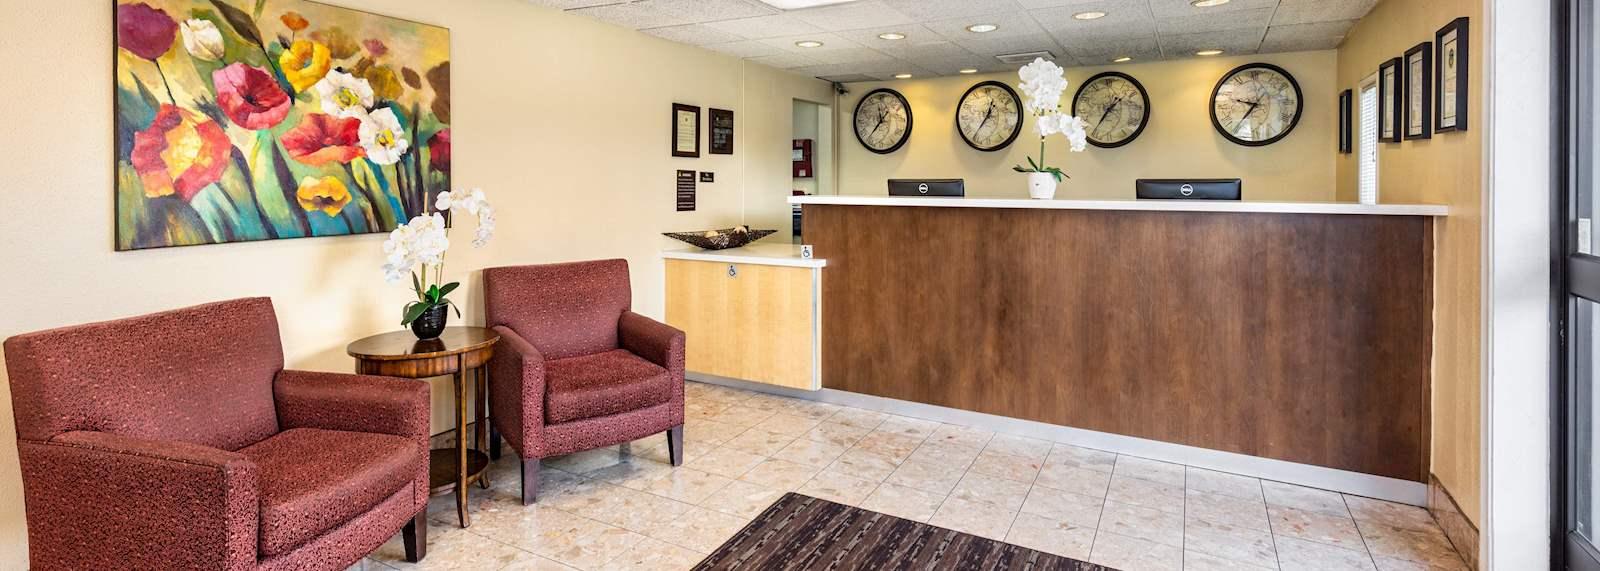 Key inn and suites Tustin - Hotel Lobby